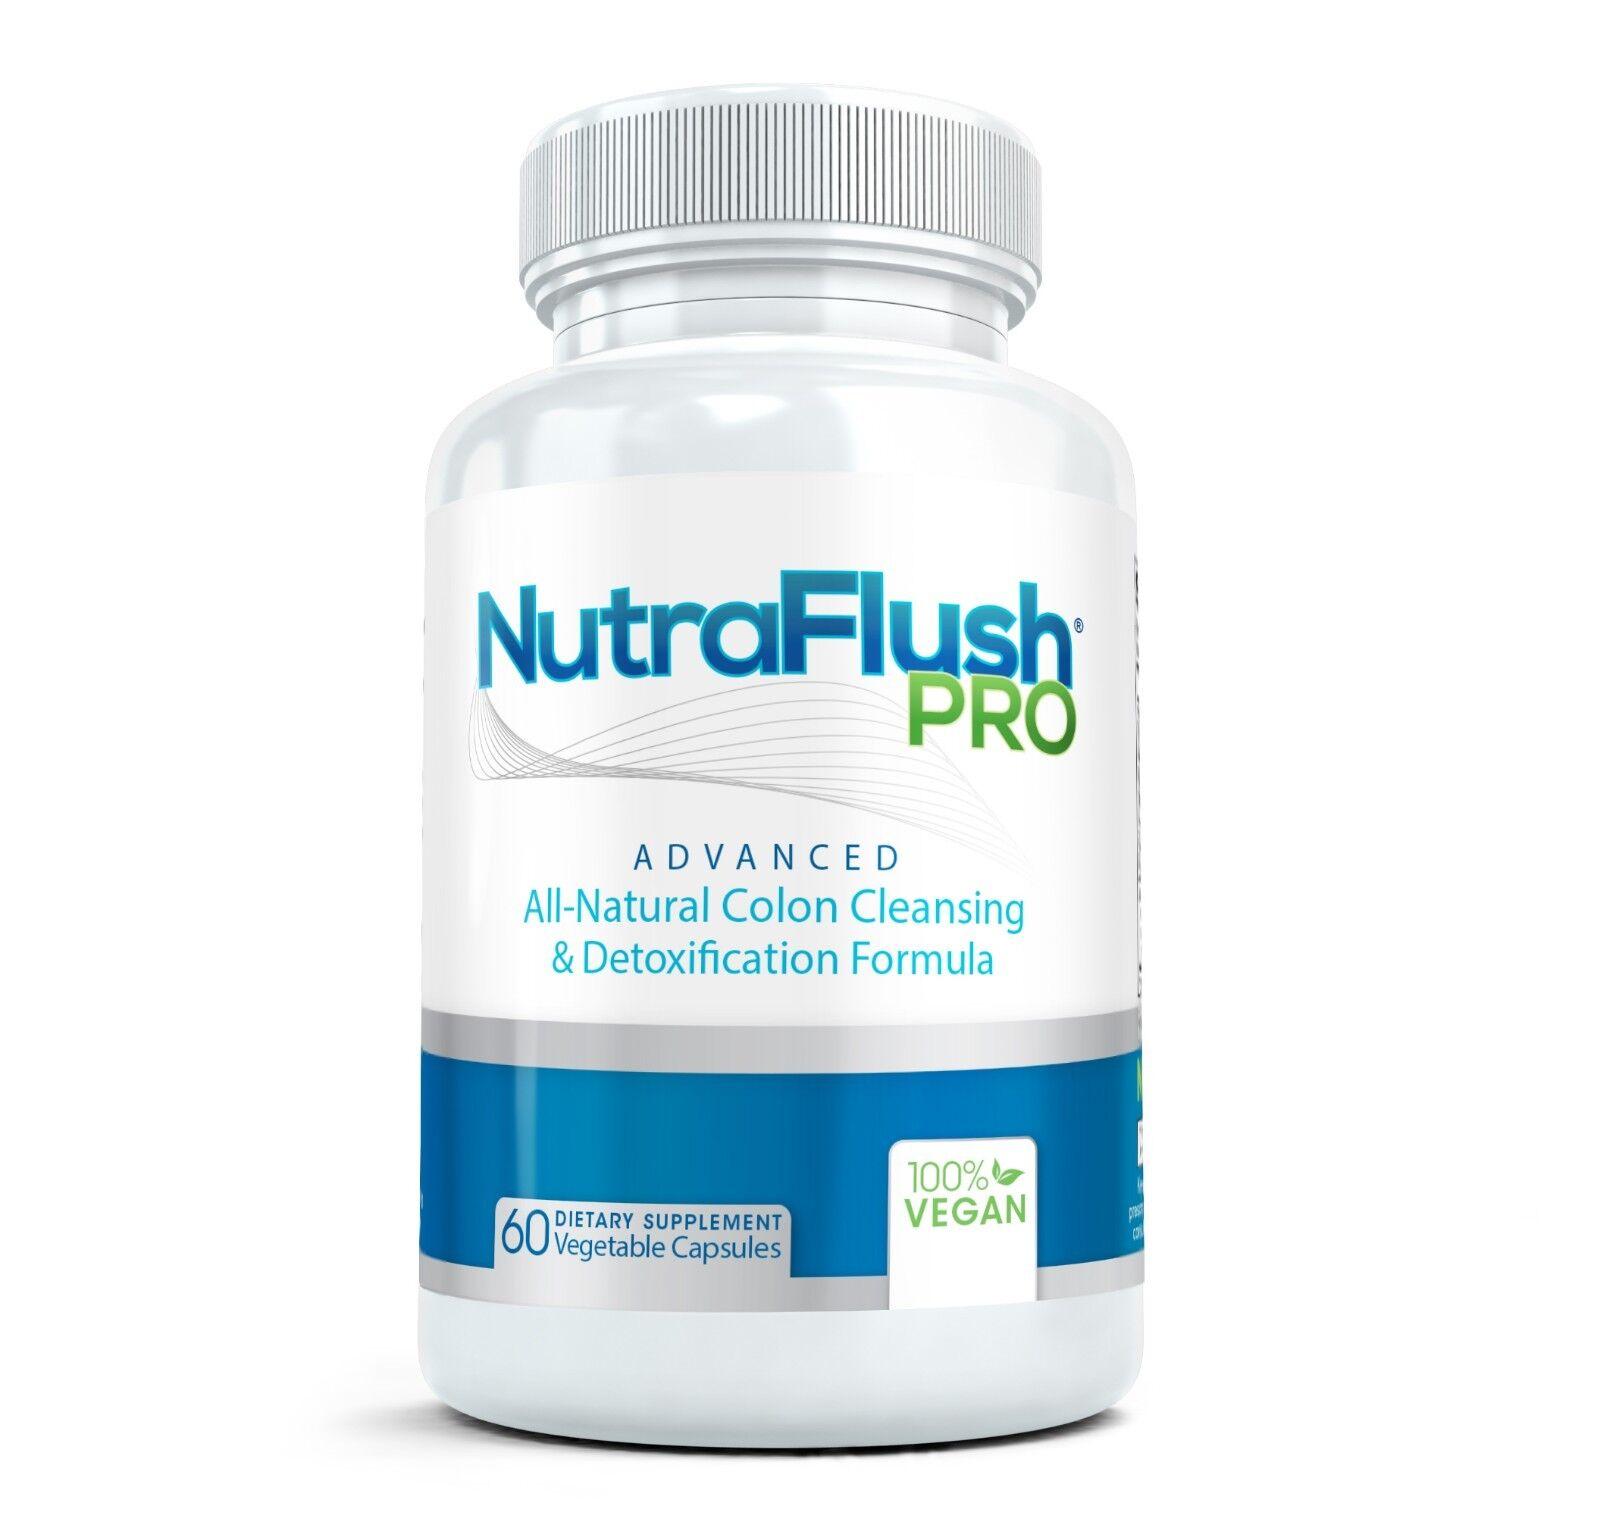 NutraFlush PRO All Natural Colon Cleansing & Detoxification Formula (60 Capsule)